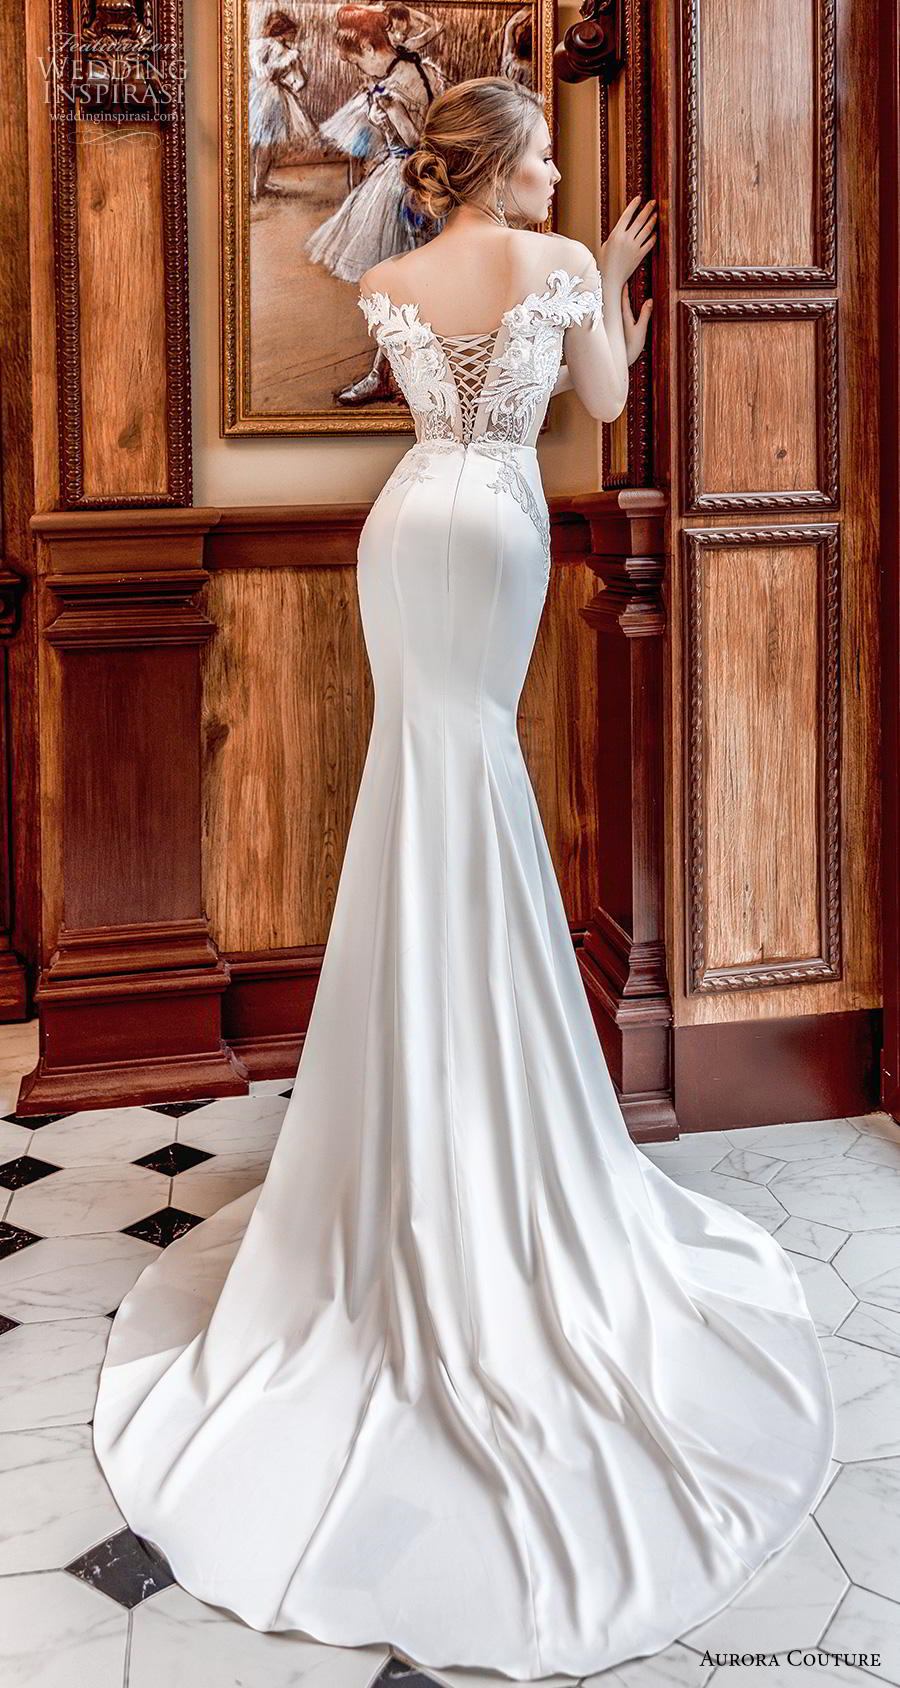 aurora couture 2019 bridal cap sleeves off the shoulder v neck heavily embellished bodice elegant sheath wedding dress corset back medium train (15) bv